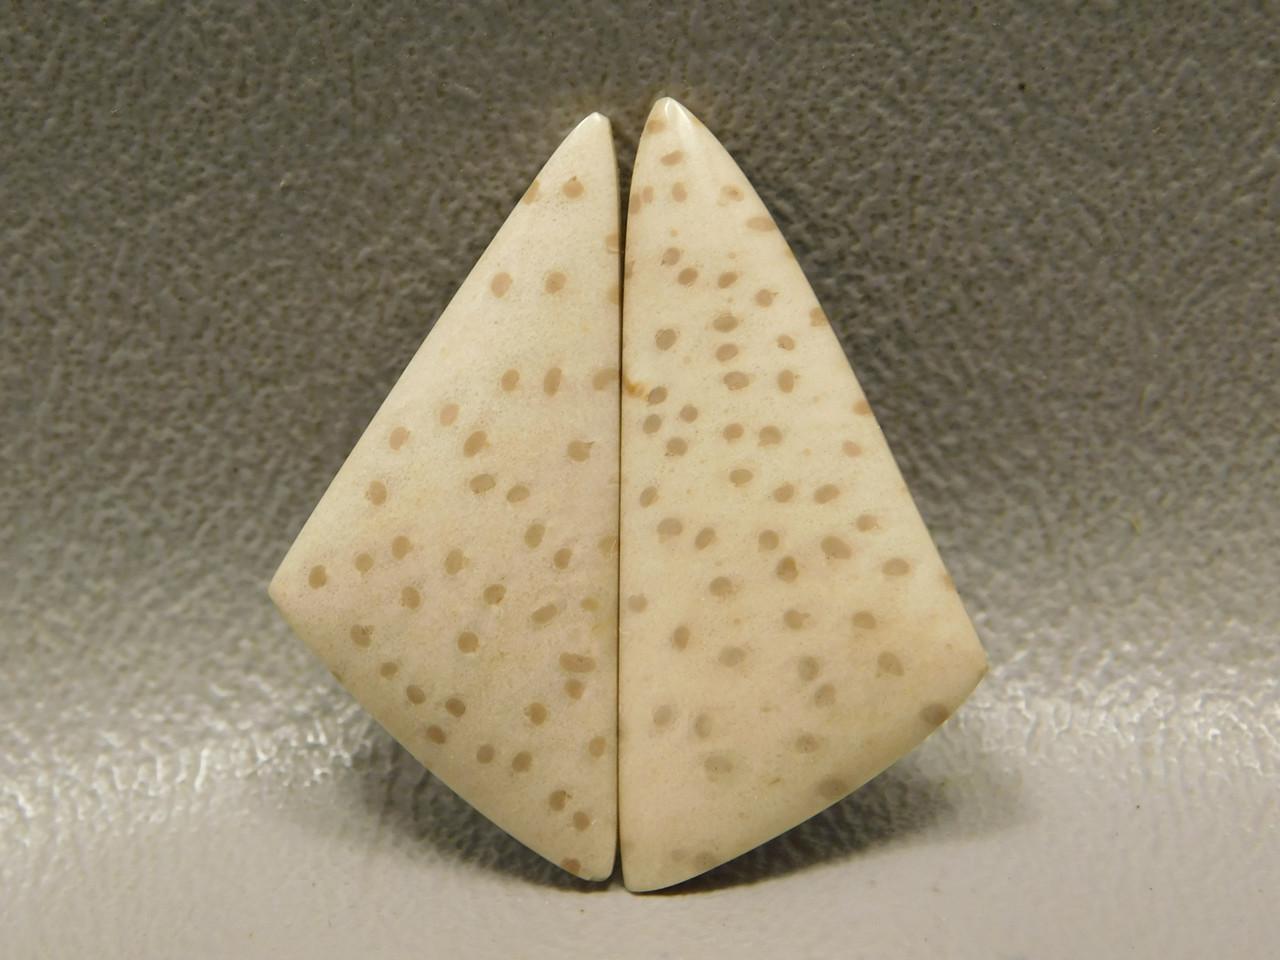 Fossil Palm Wood Matched Pairs Polka Dot Tan Cabochons #7